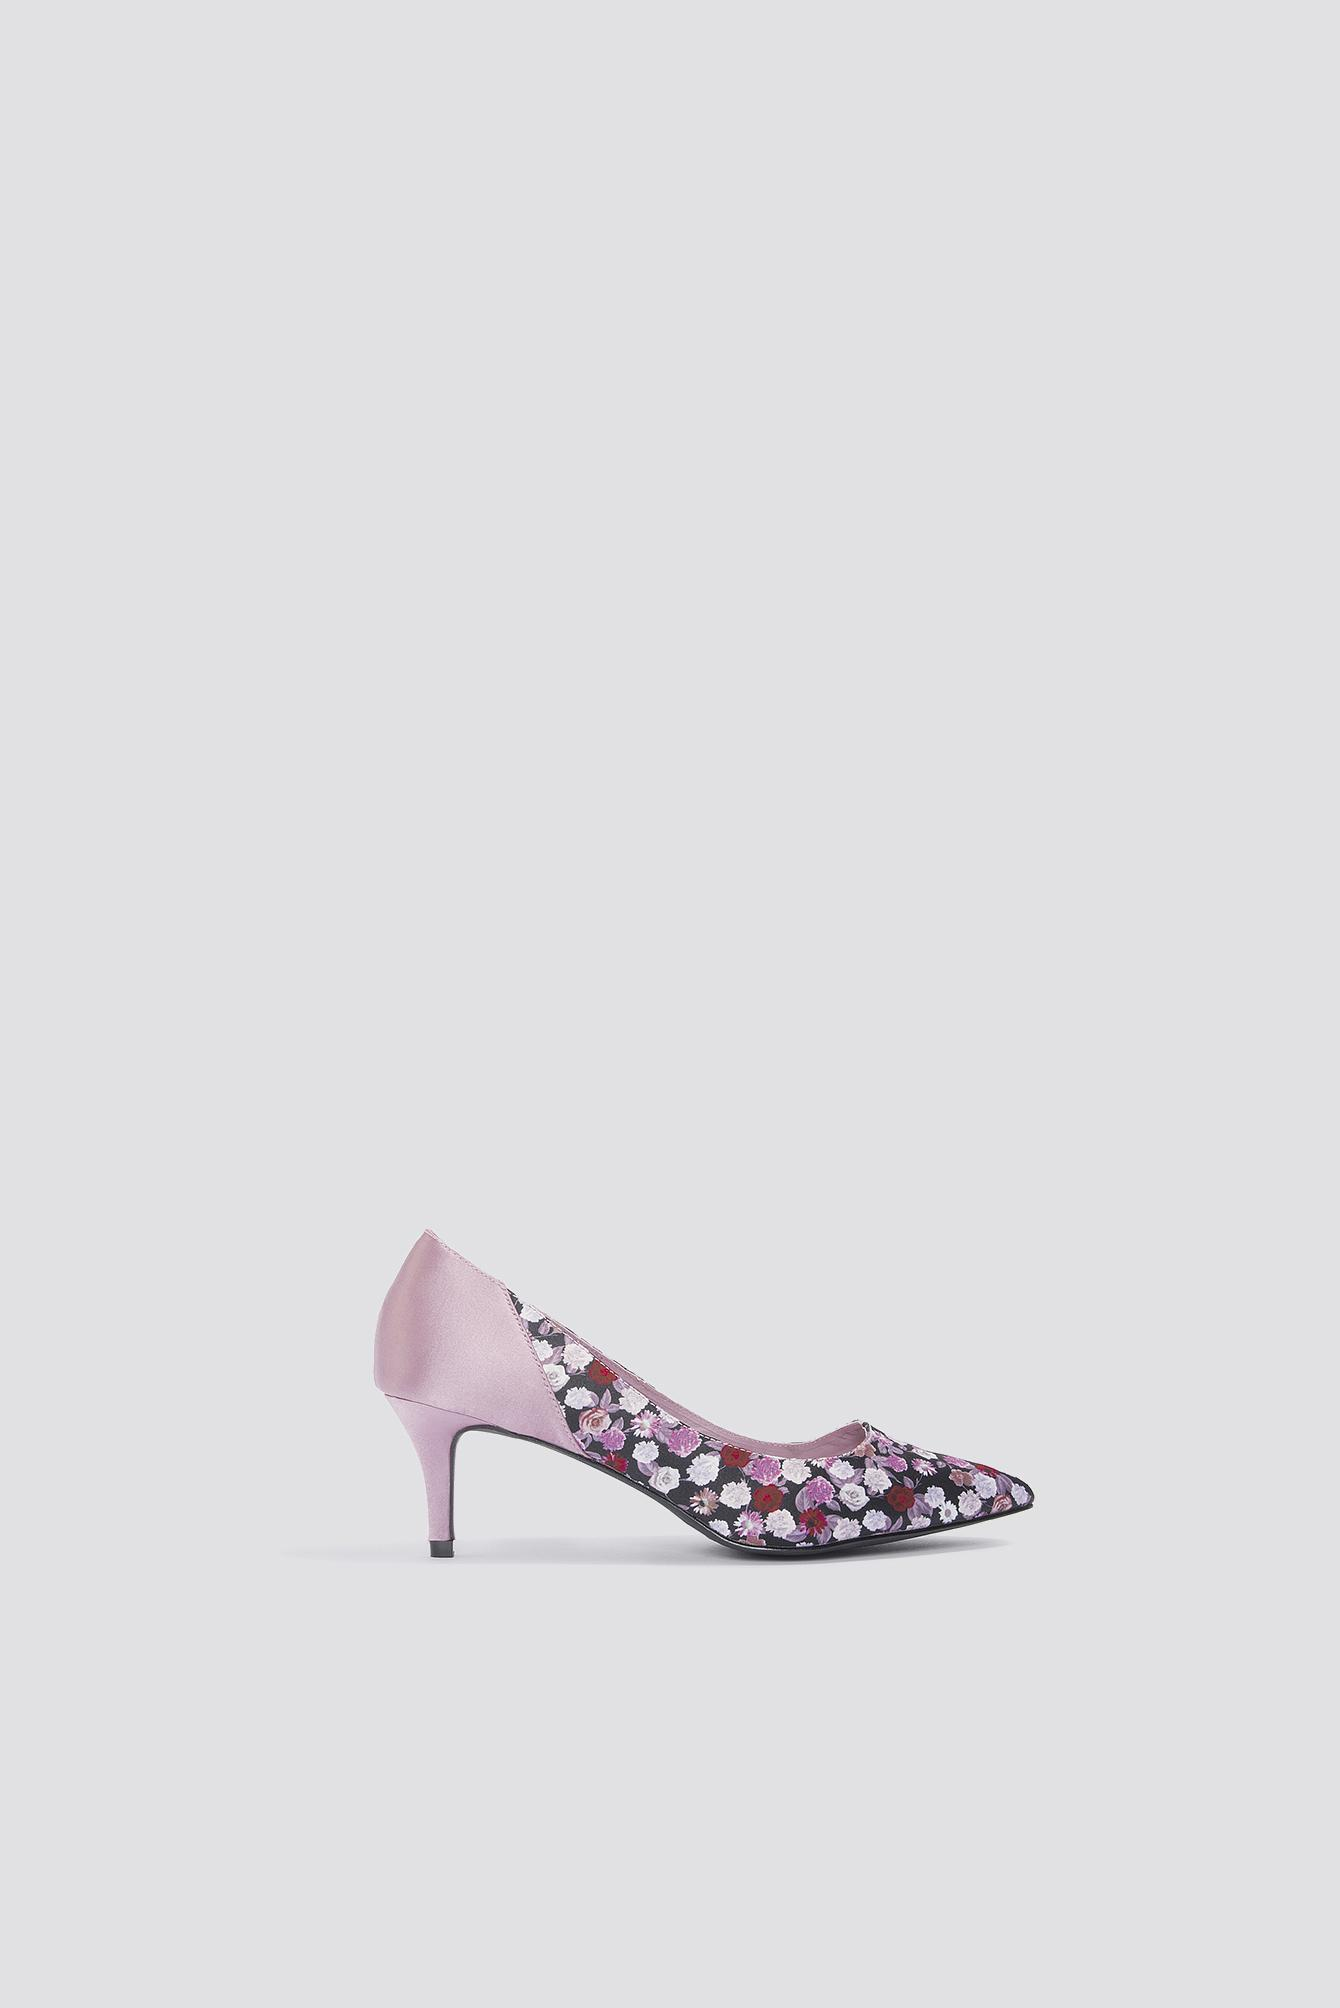 e83ef7dded Na-Kd Block Mid Heel Satin Pumps - Pink, Multicolor In Pink,Multicolor